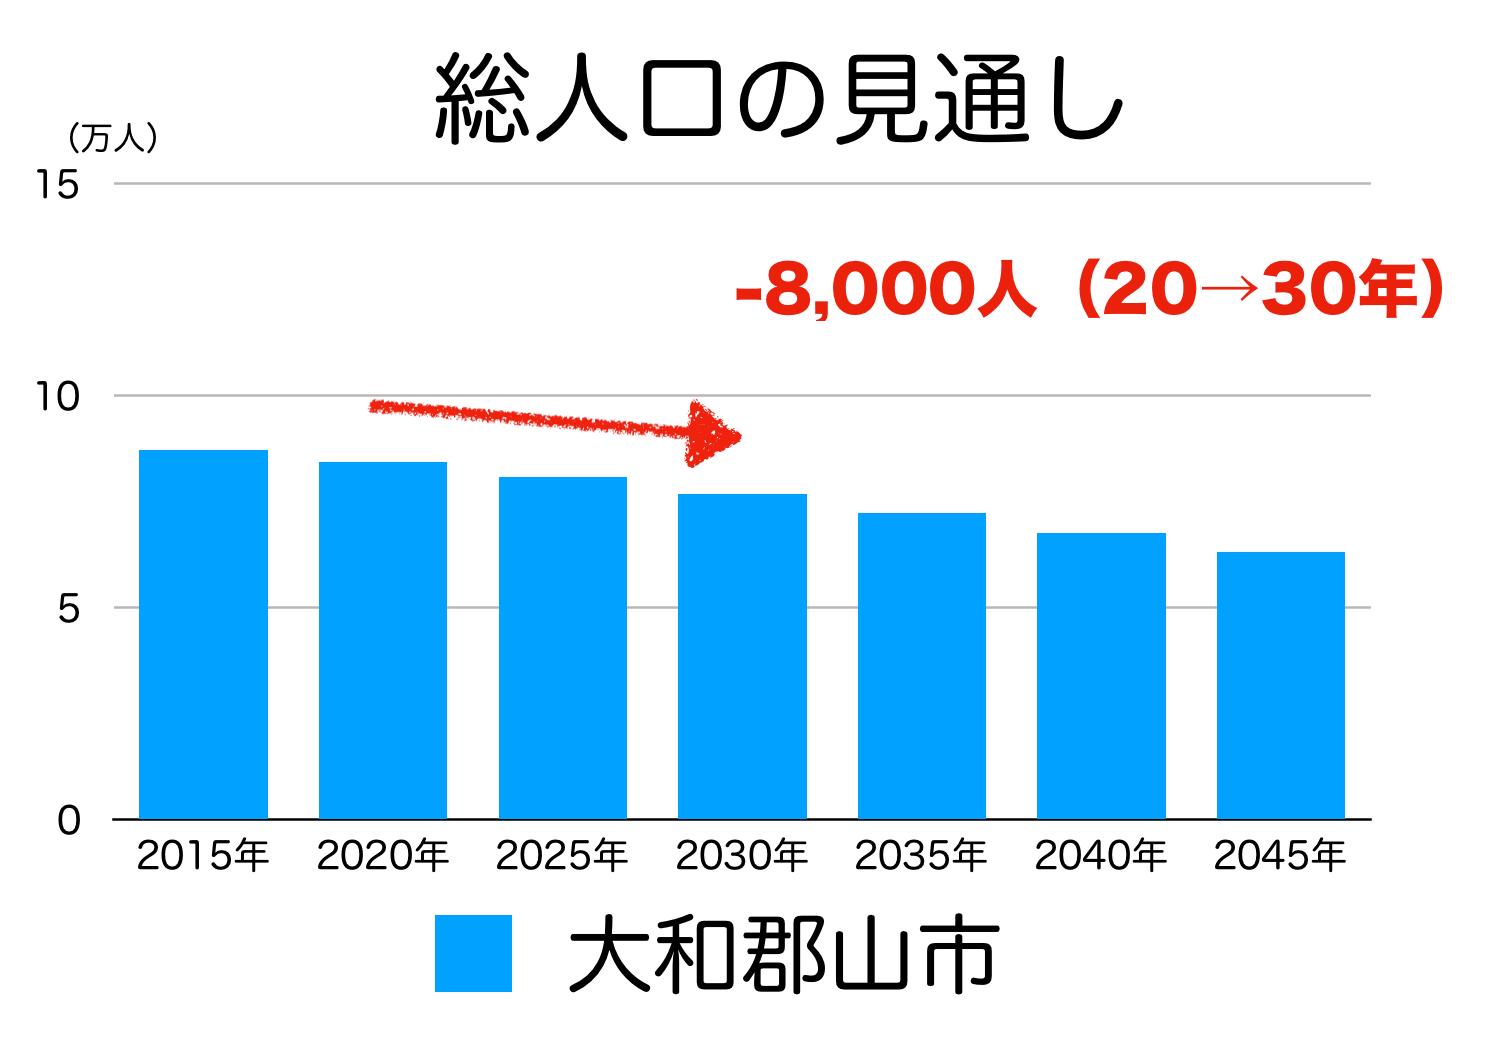 大和郡山市の人口予測